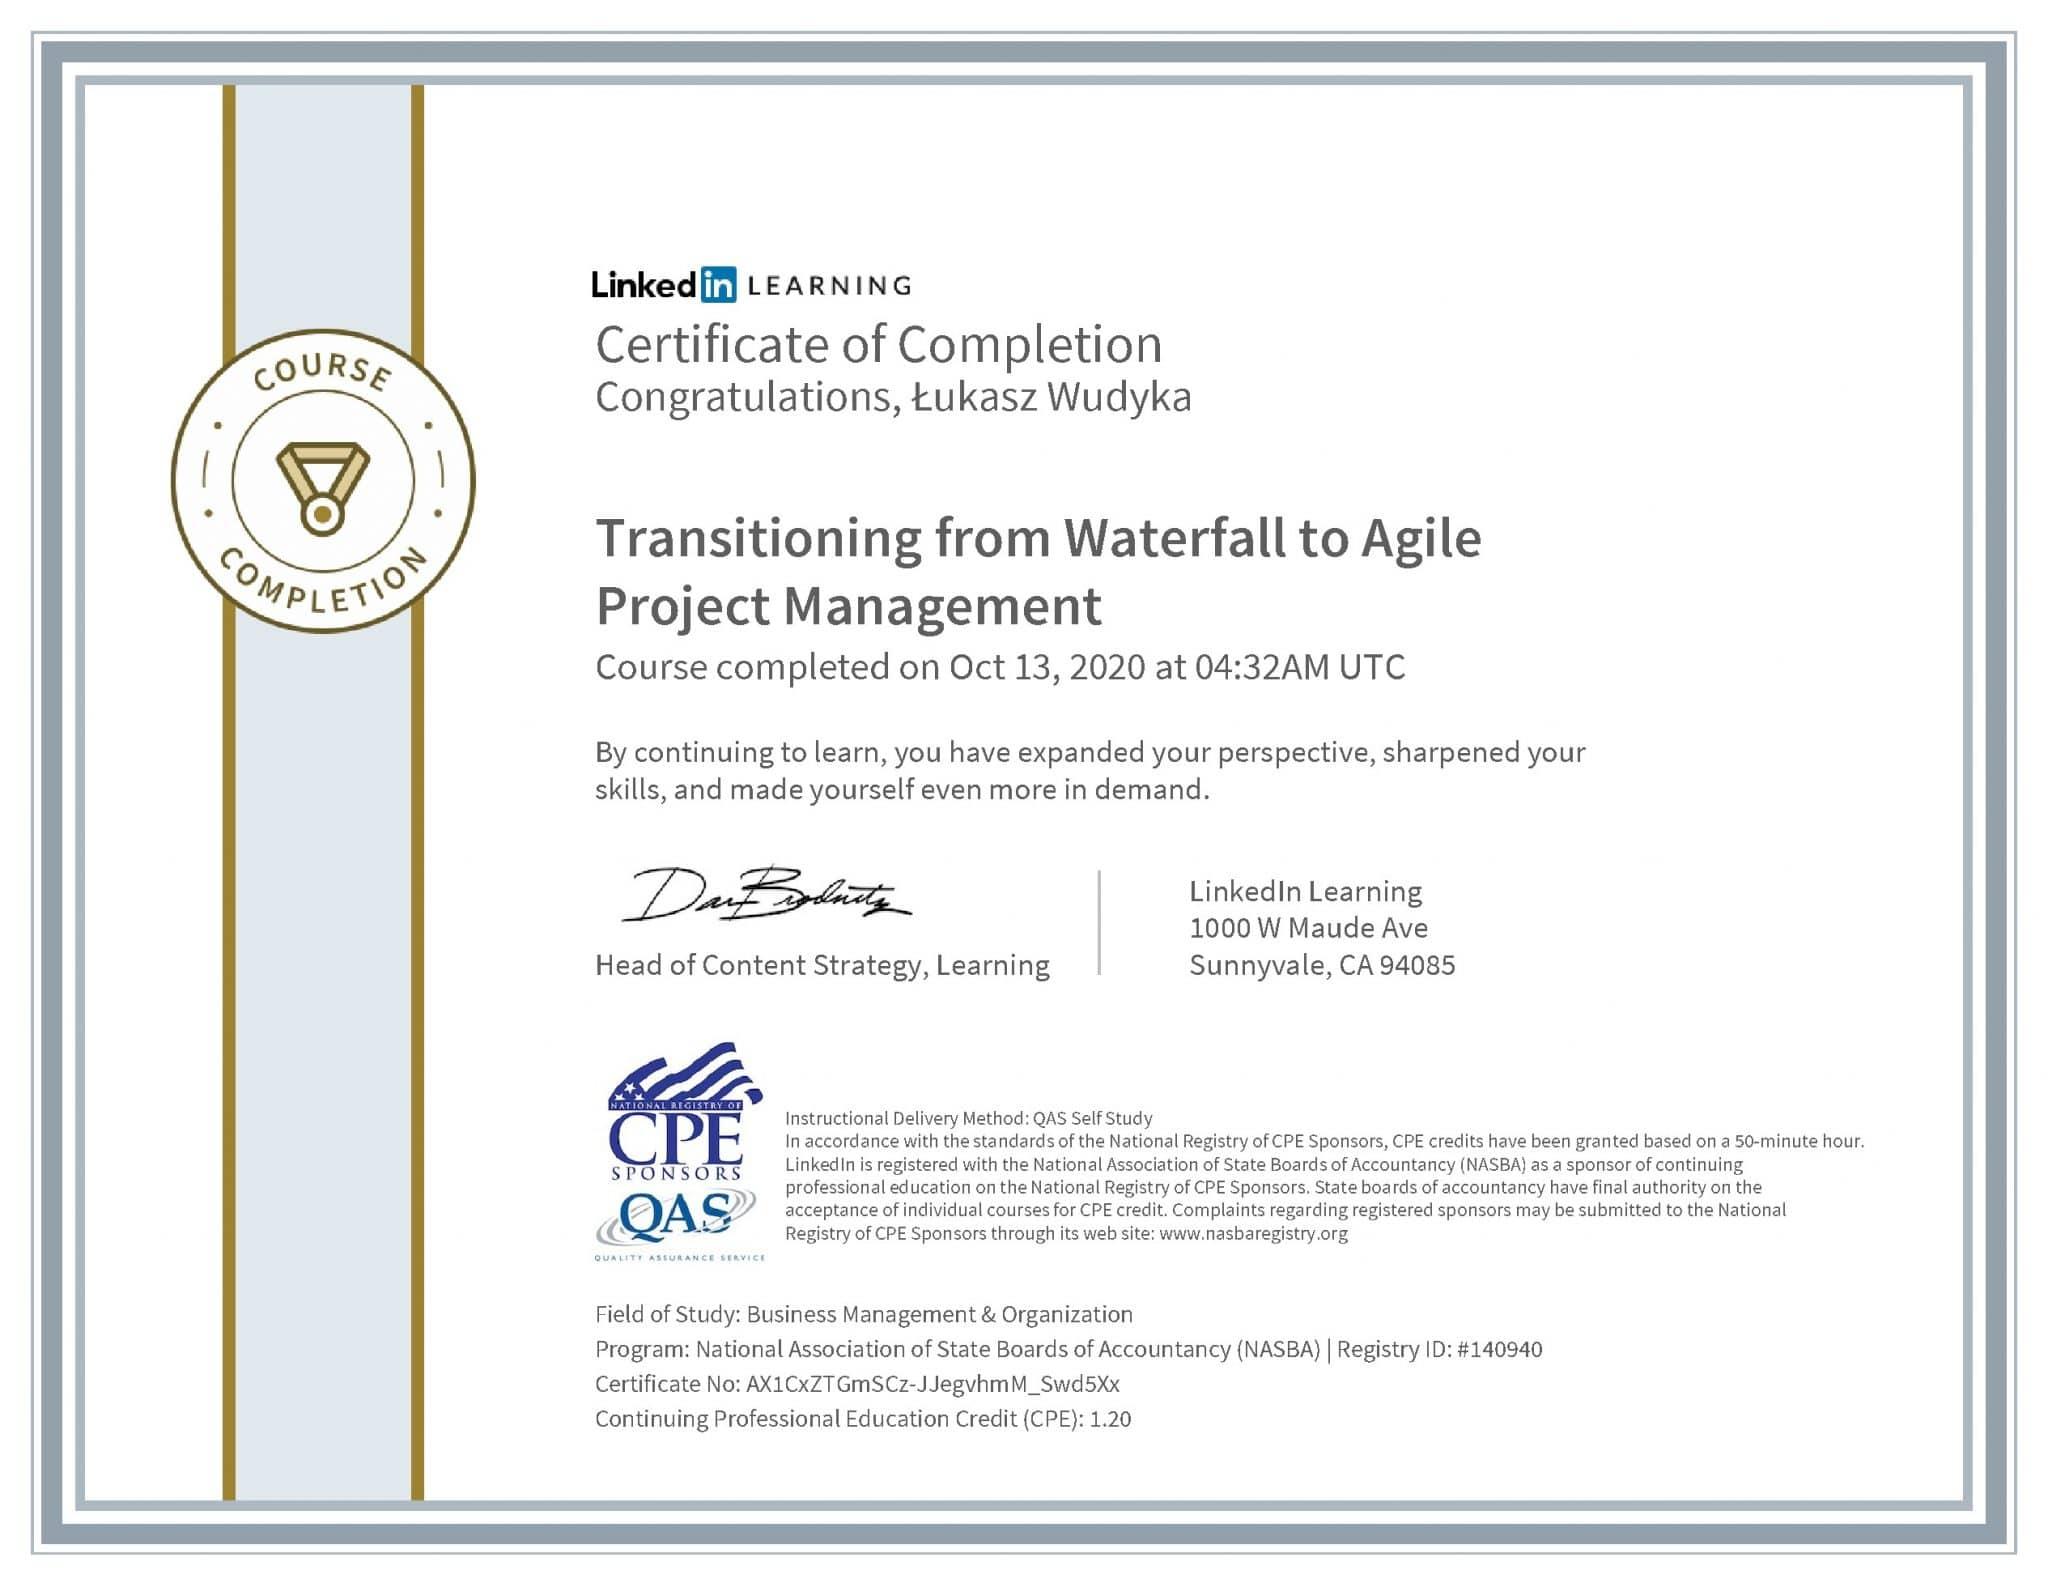 Łukasz Wudyka certyfikat LinkedIn Transitioning from Waterfall to Agile Project Management NASBA